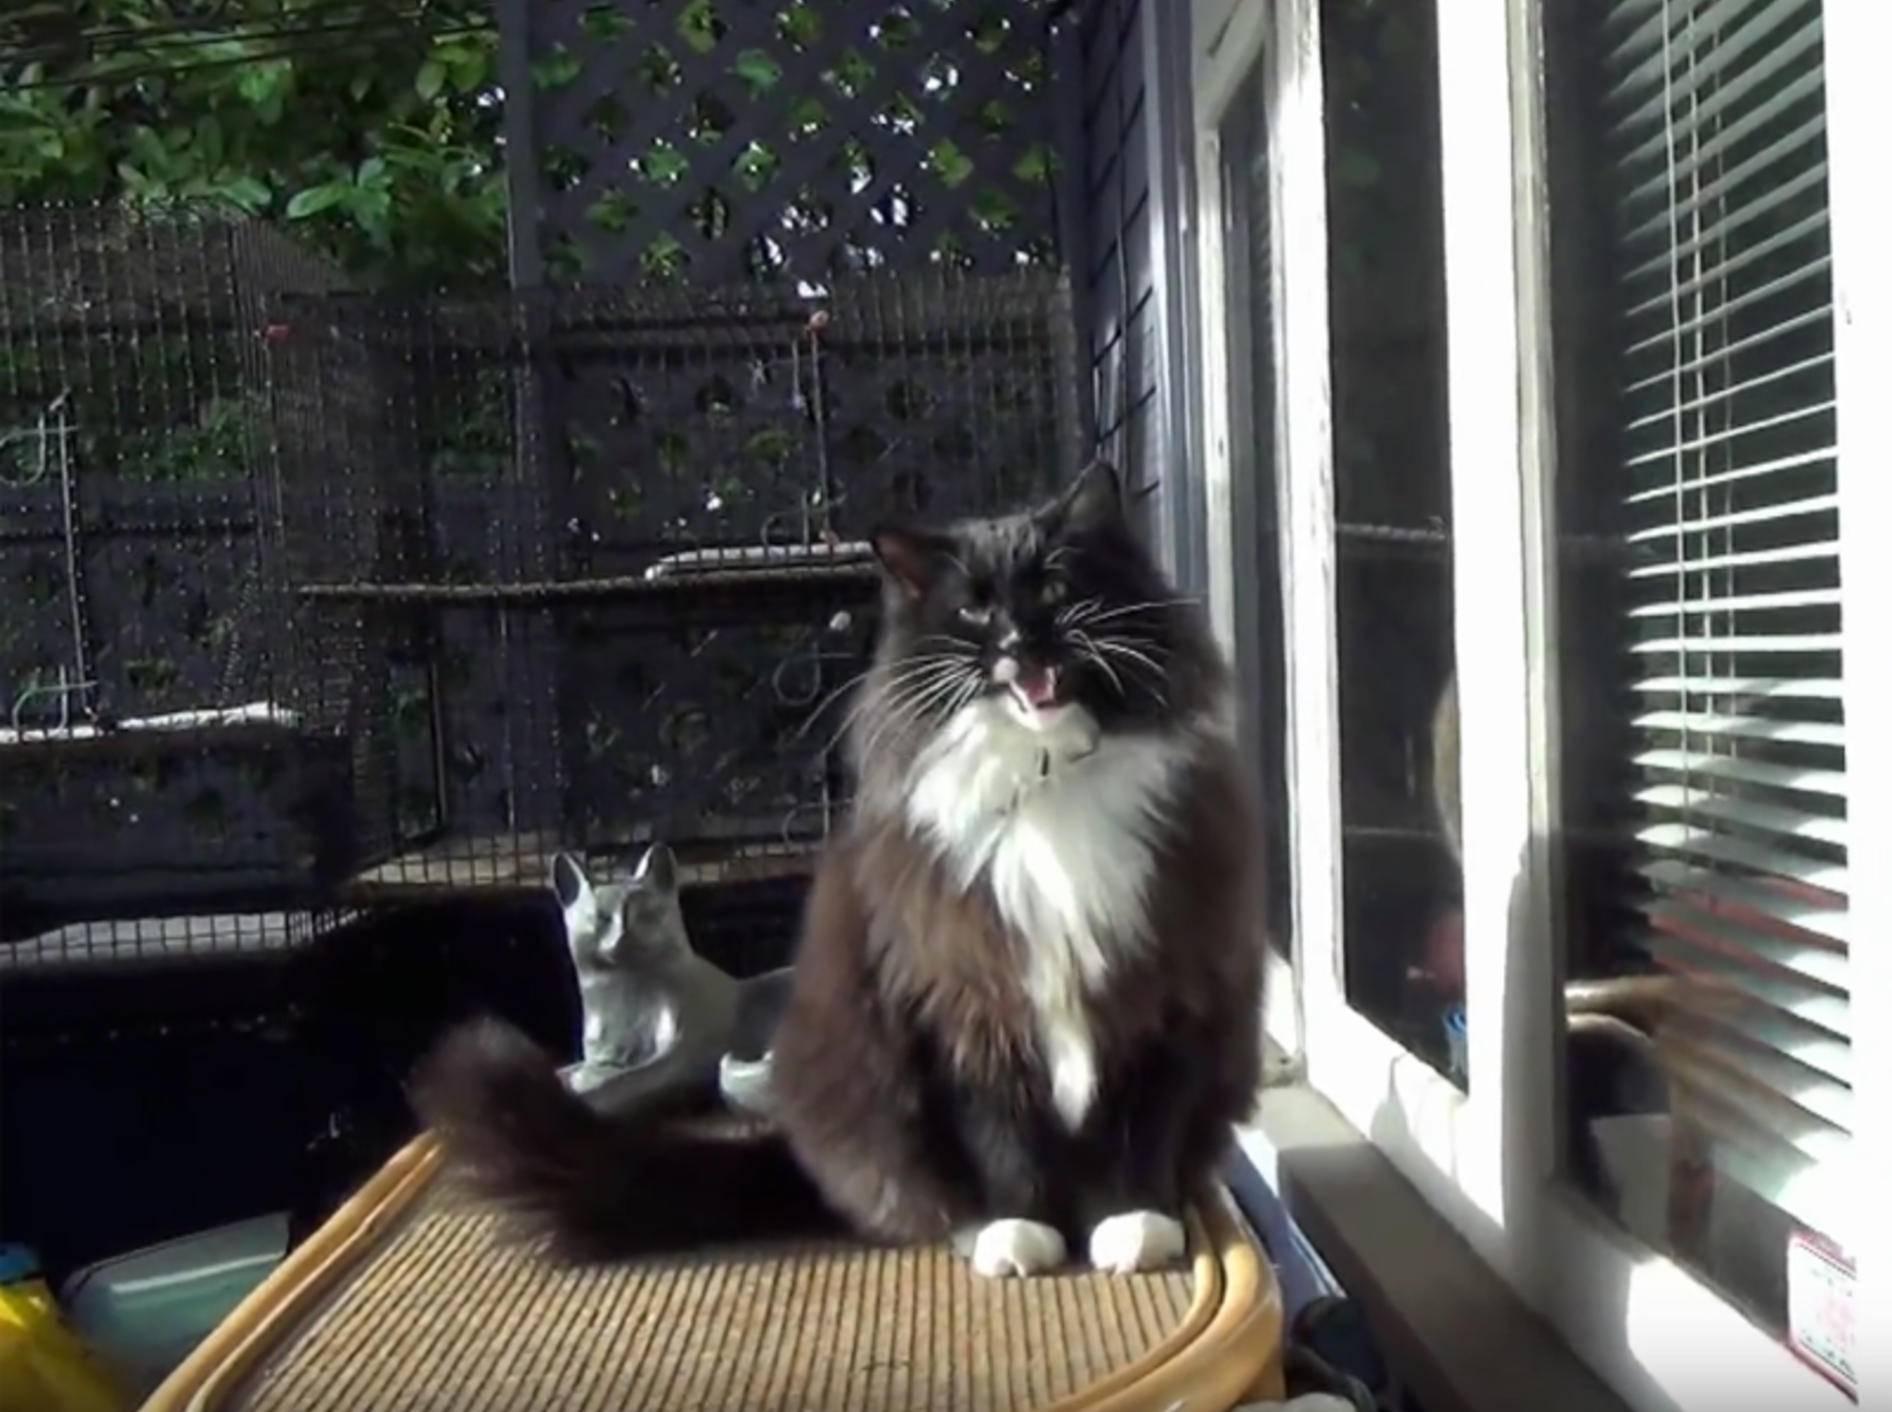 Flauschkater Freddy Mercury singt ein Katzenlied – YouTube / The Kits Cats